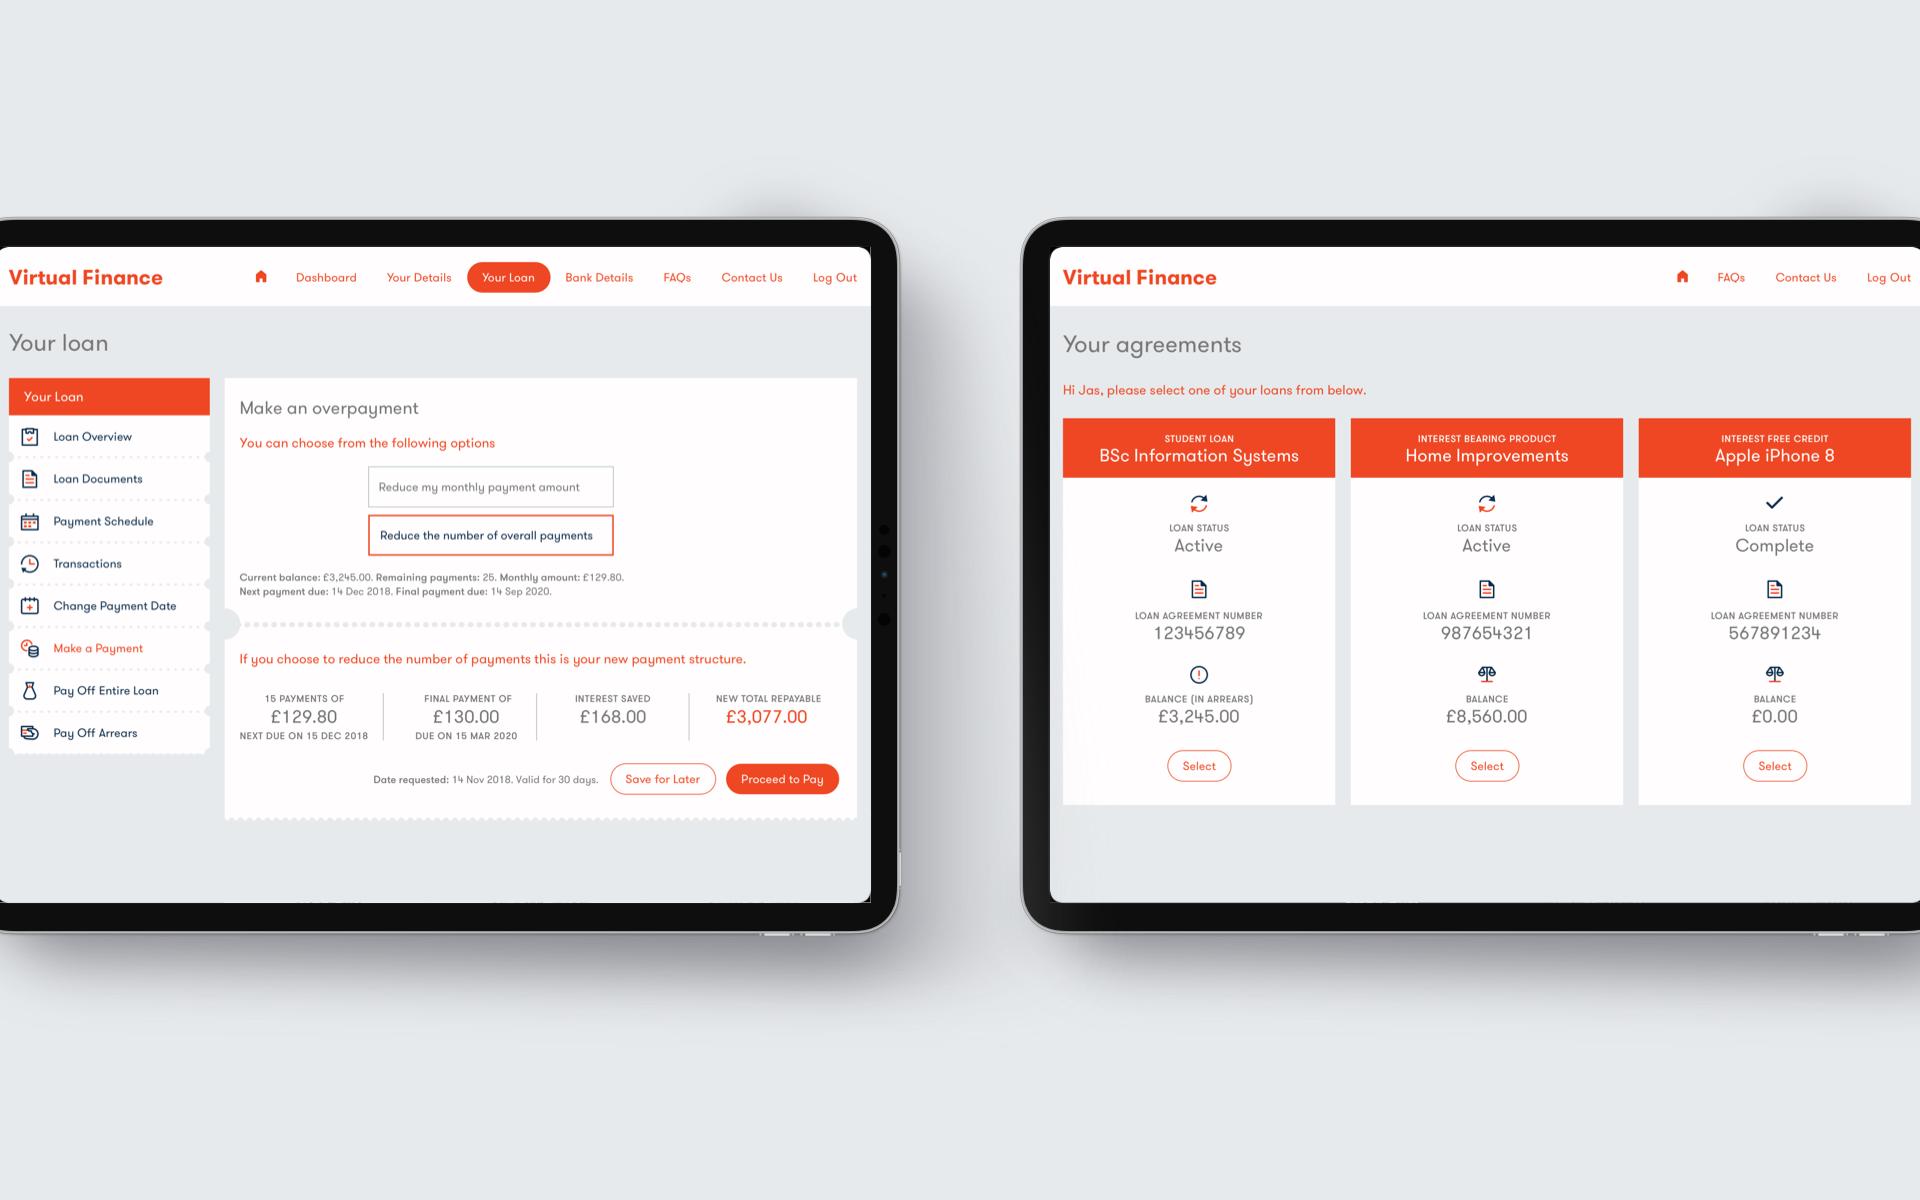 virtual-finance-ipad-screens-1